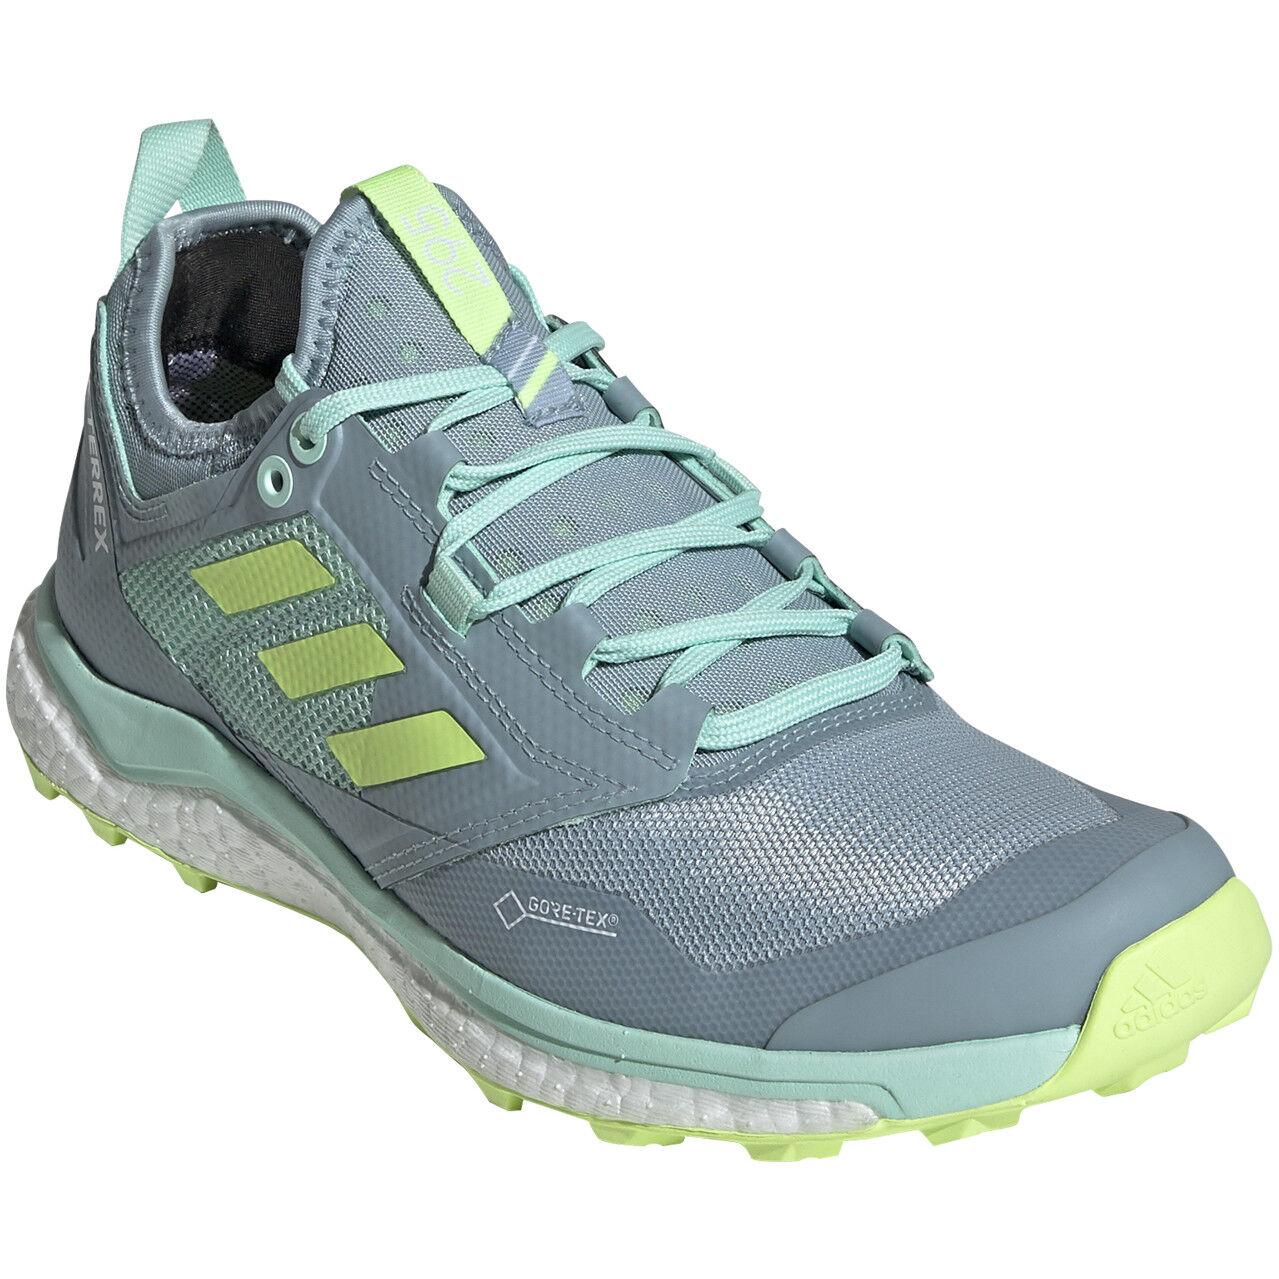 Damen Terrex Agravic XT GTX Schuhe ash grey UK 4